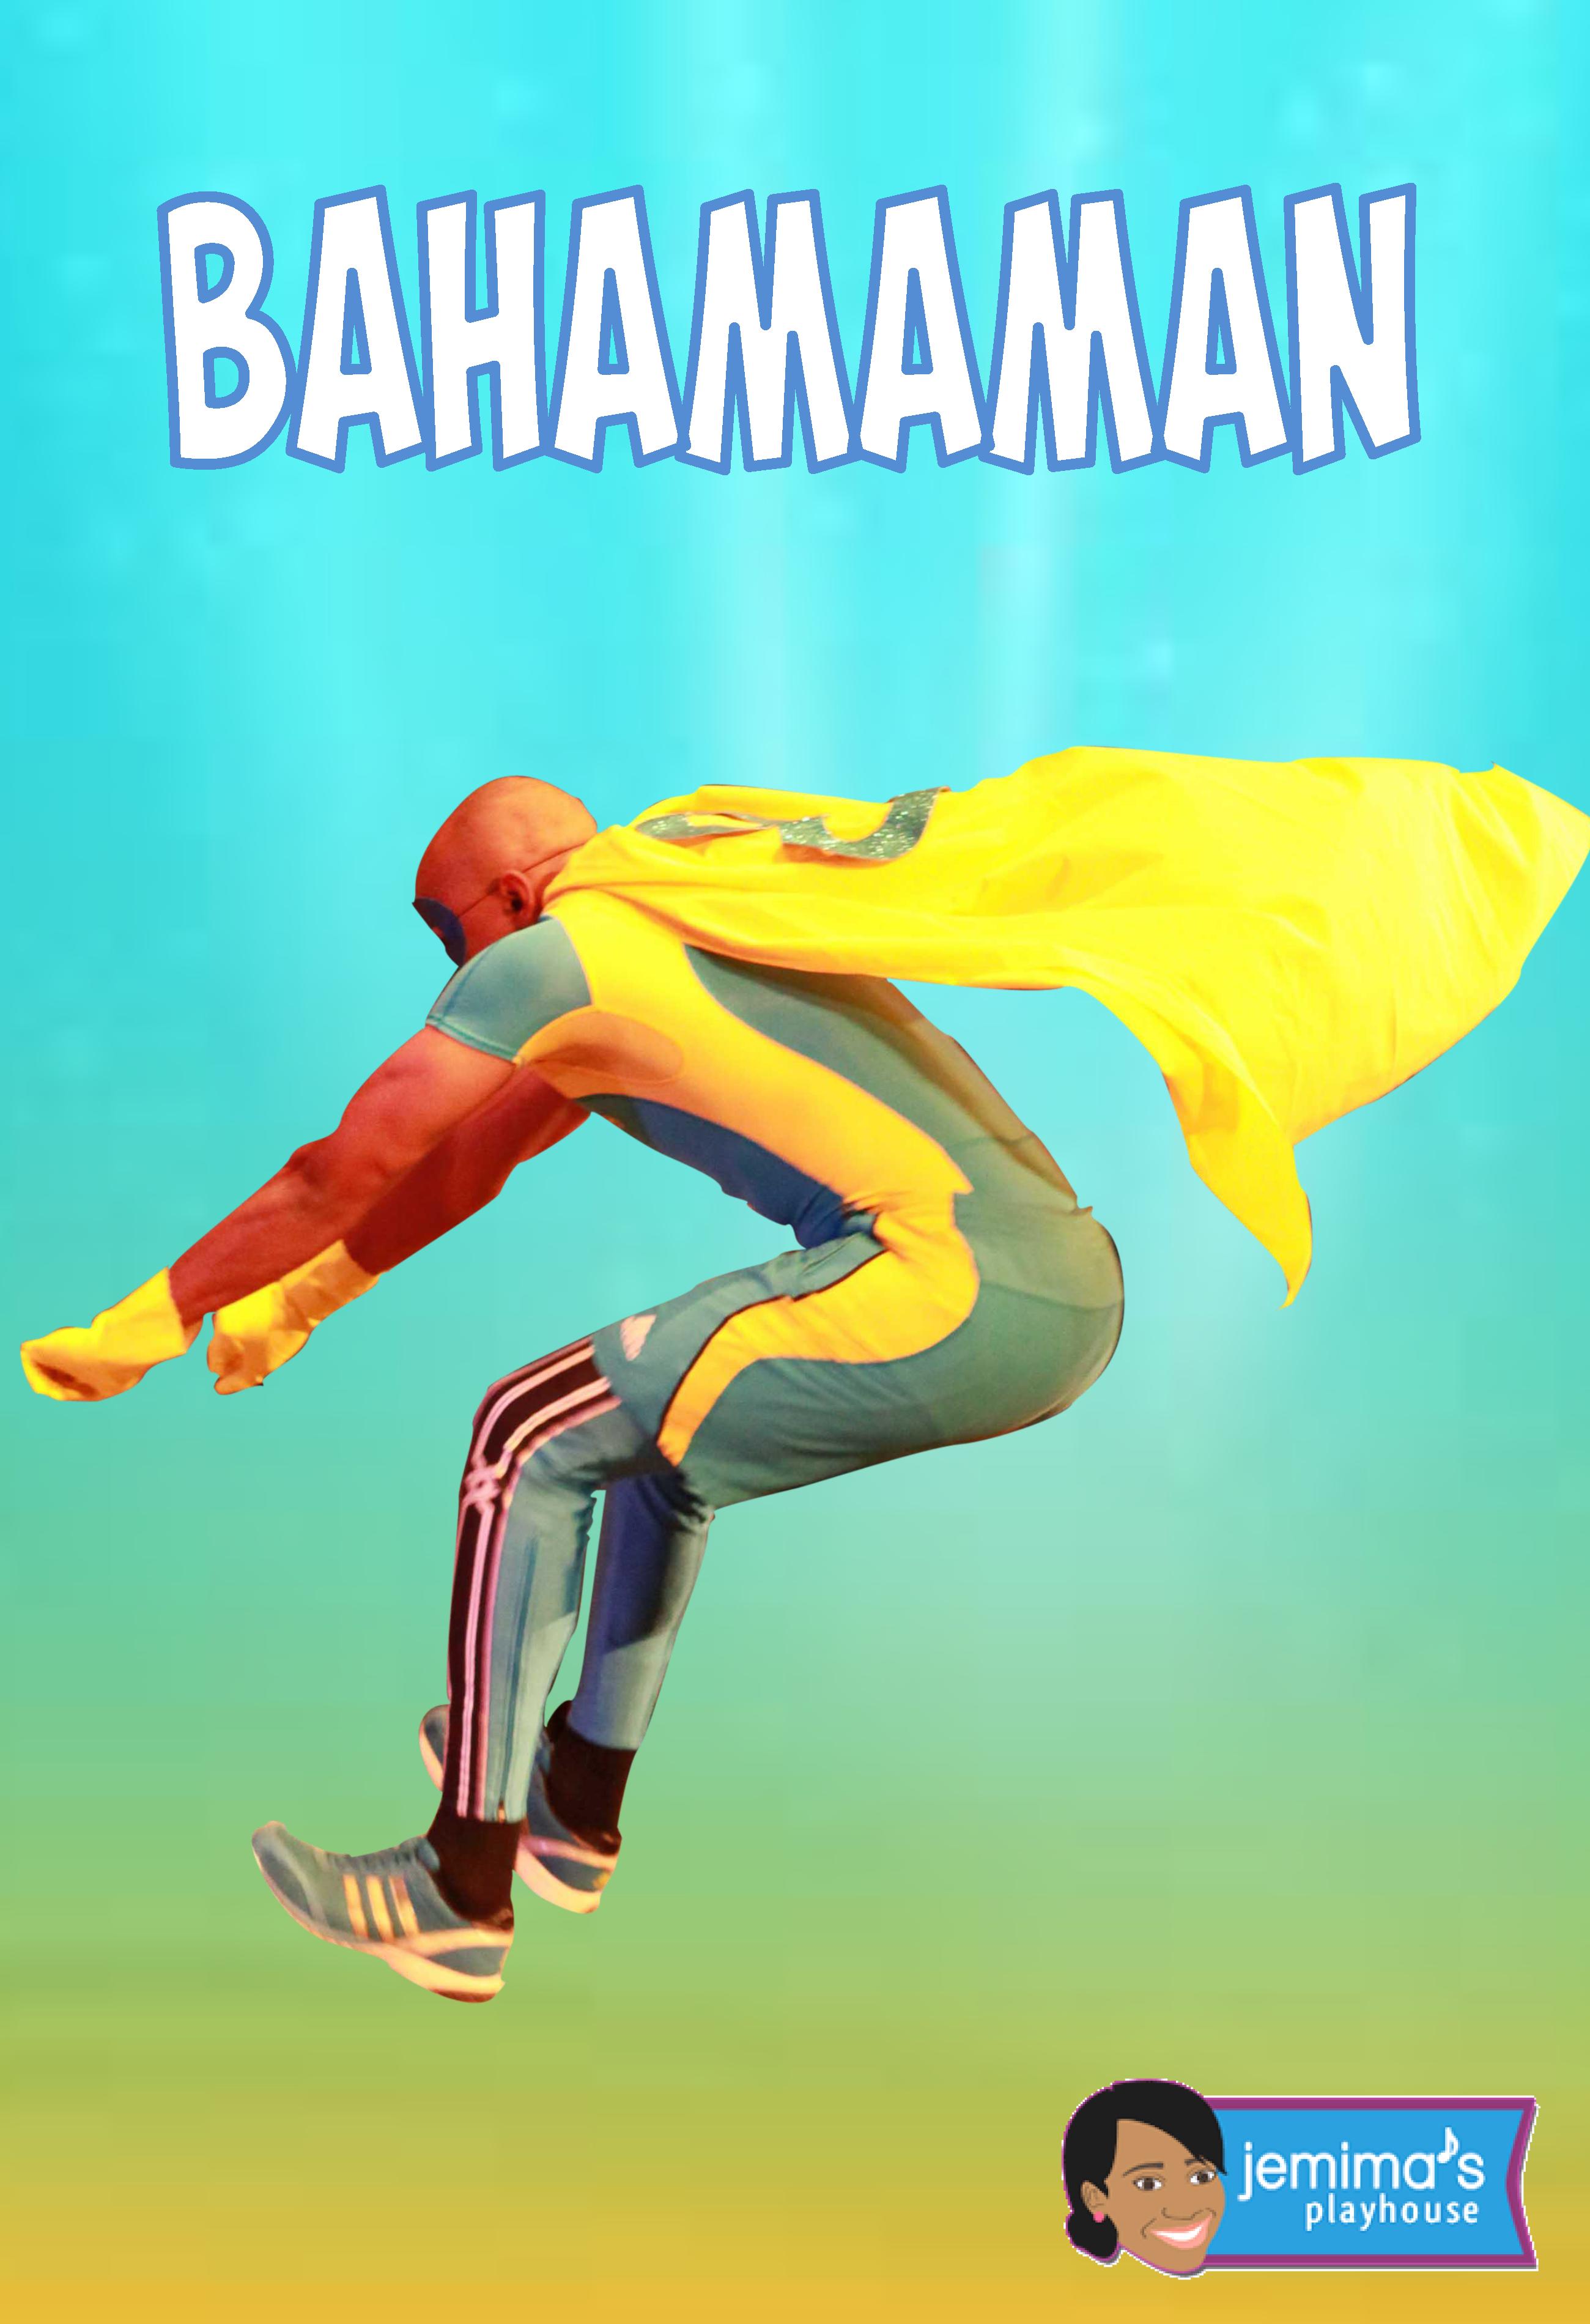 BahamaMan™